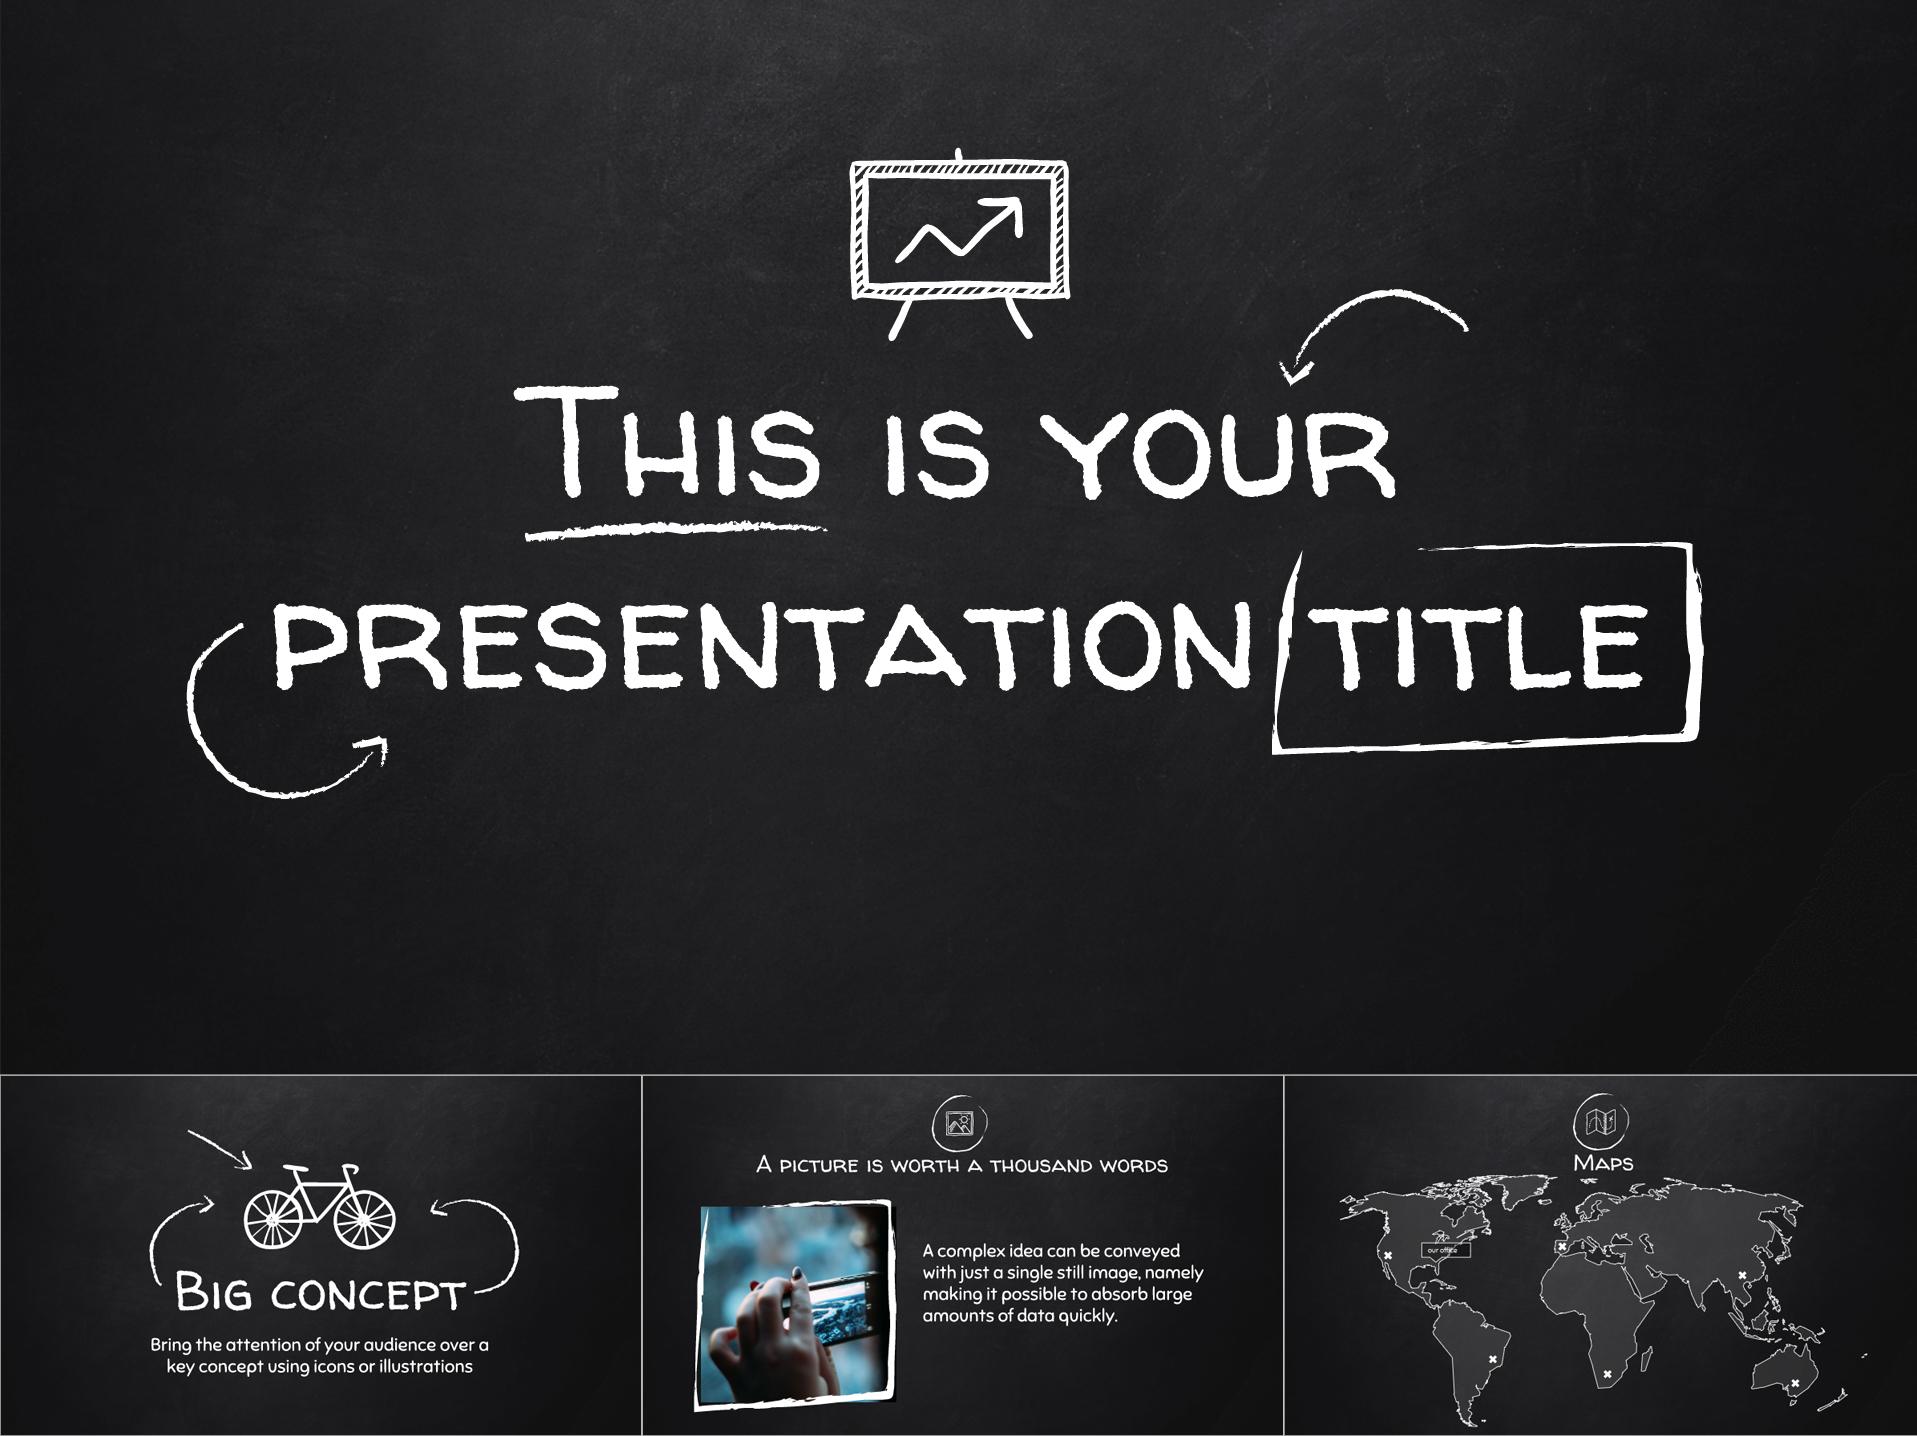 Old School Blackboard Free Template for Google Slides - The Internet Tips